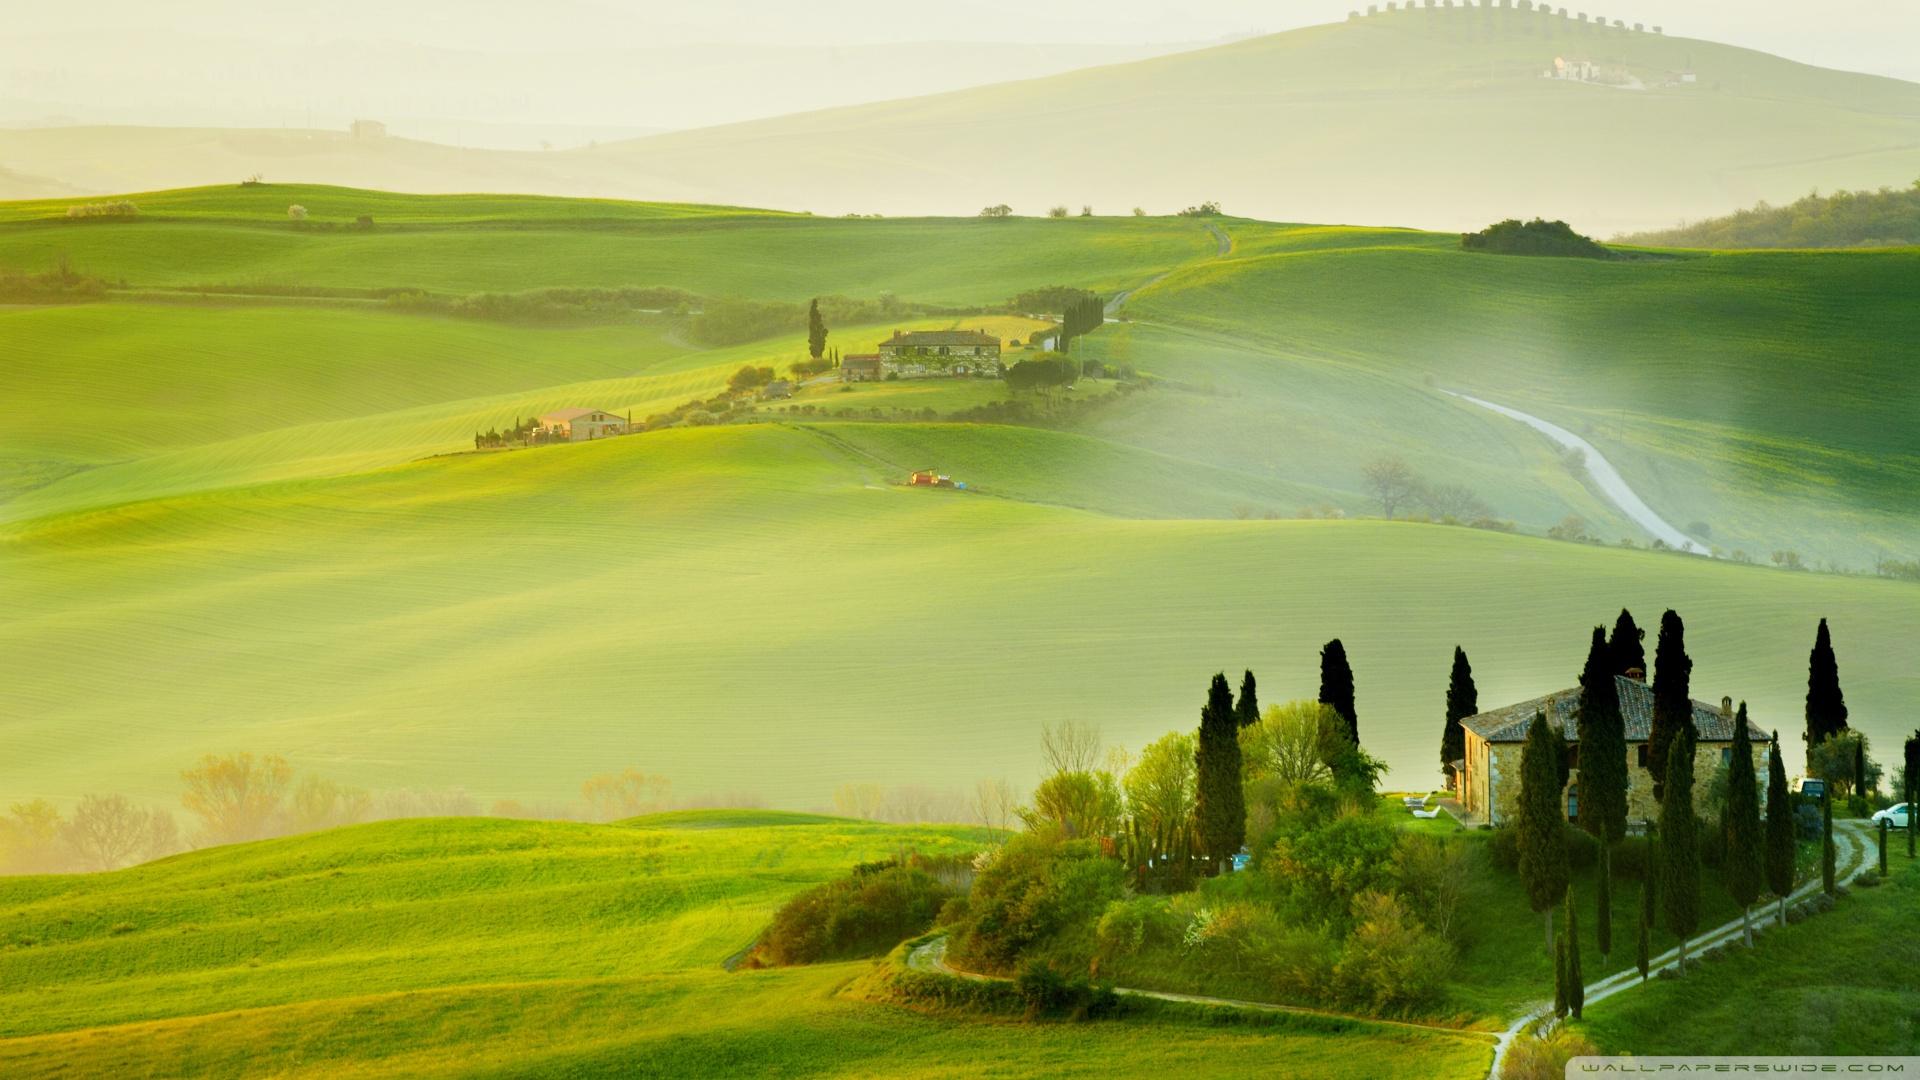 tuscany_spring_landscape-wallpaper-1920x1080